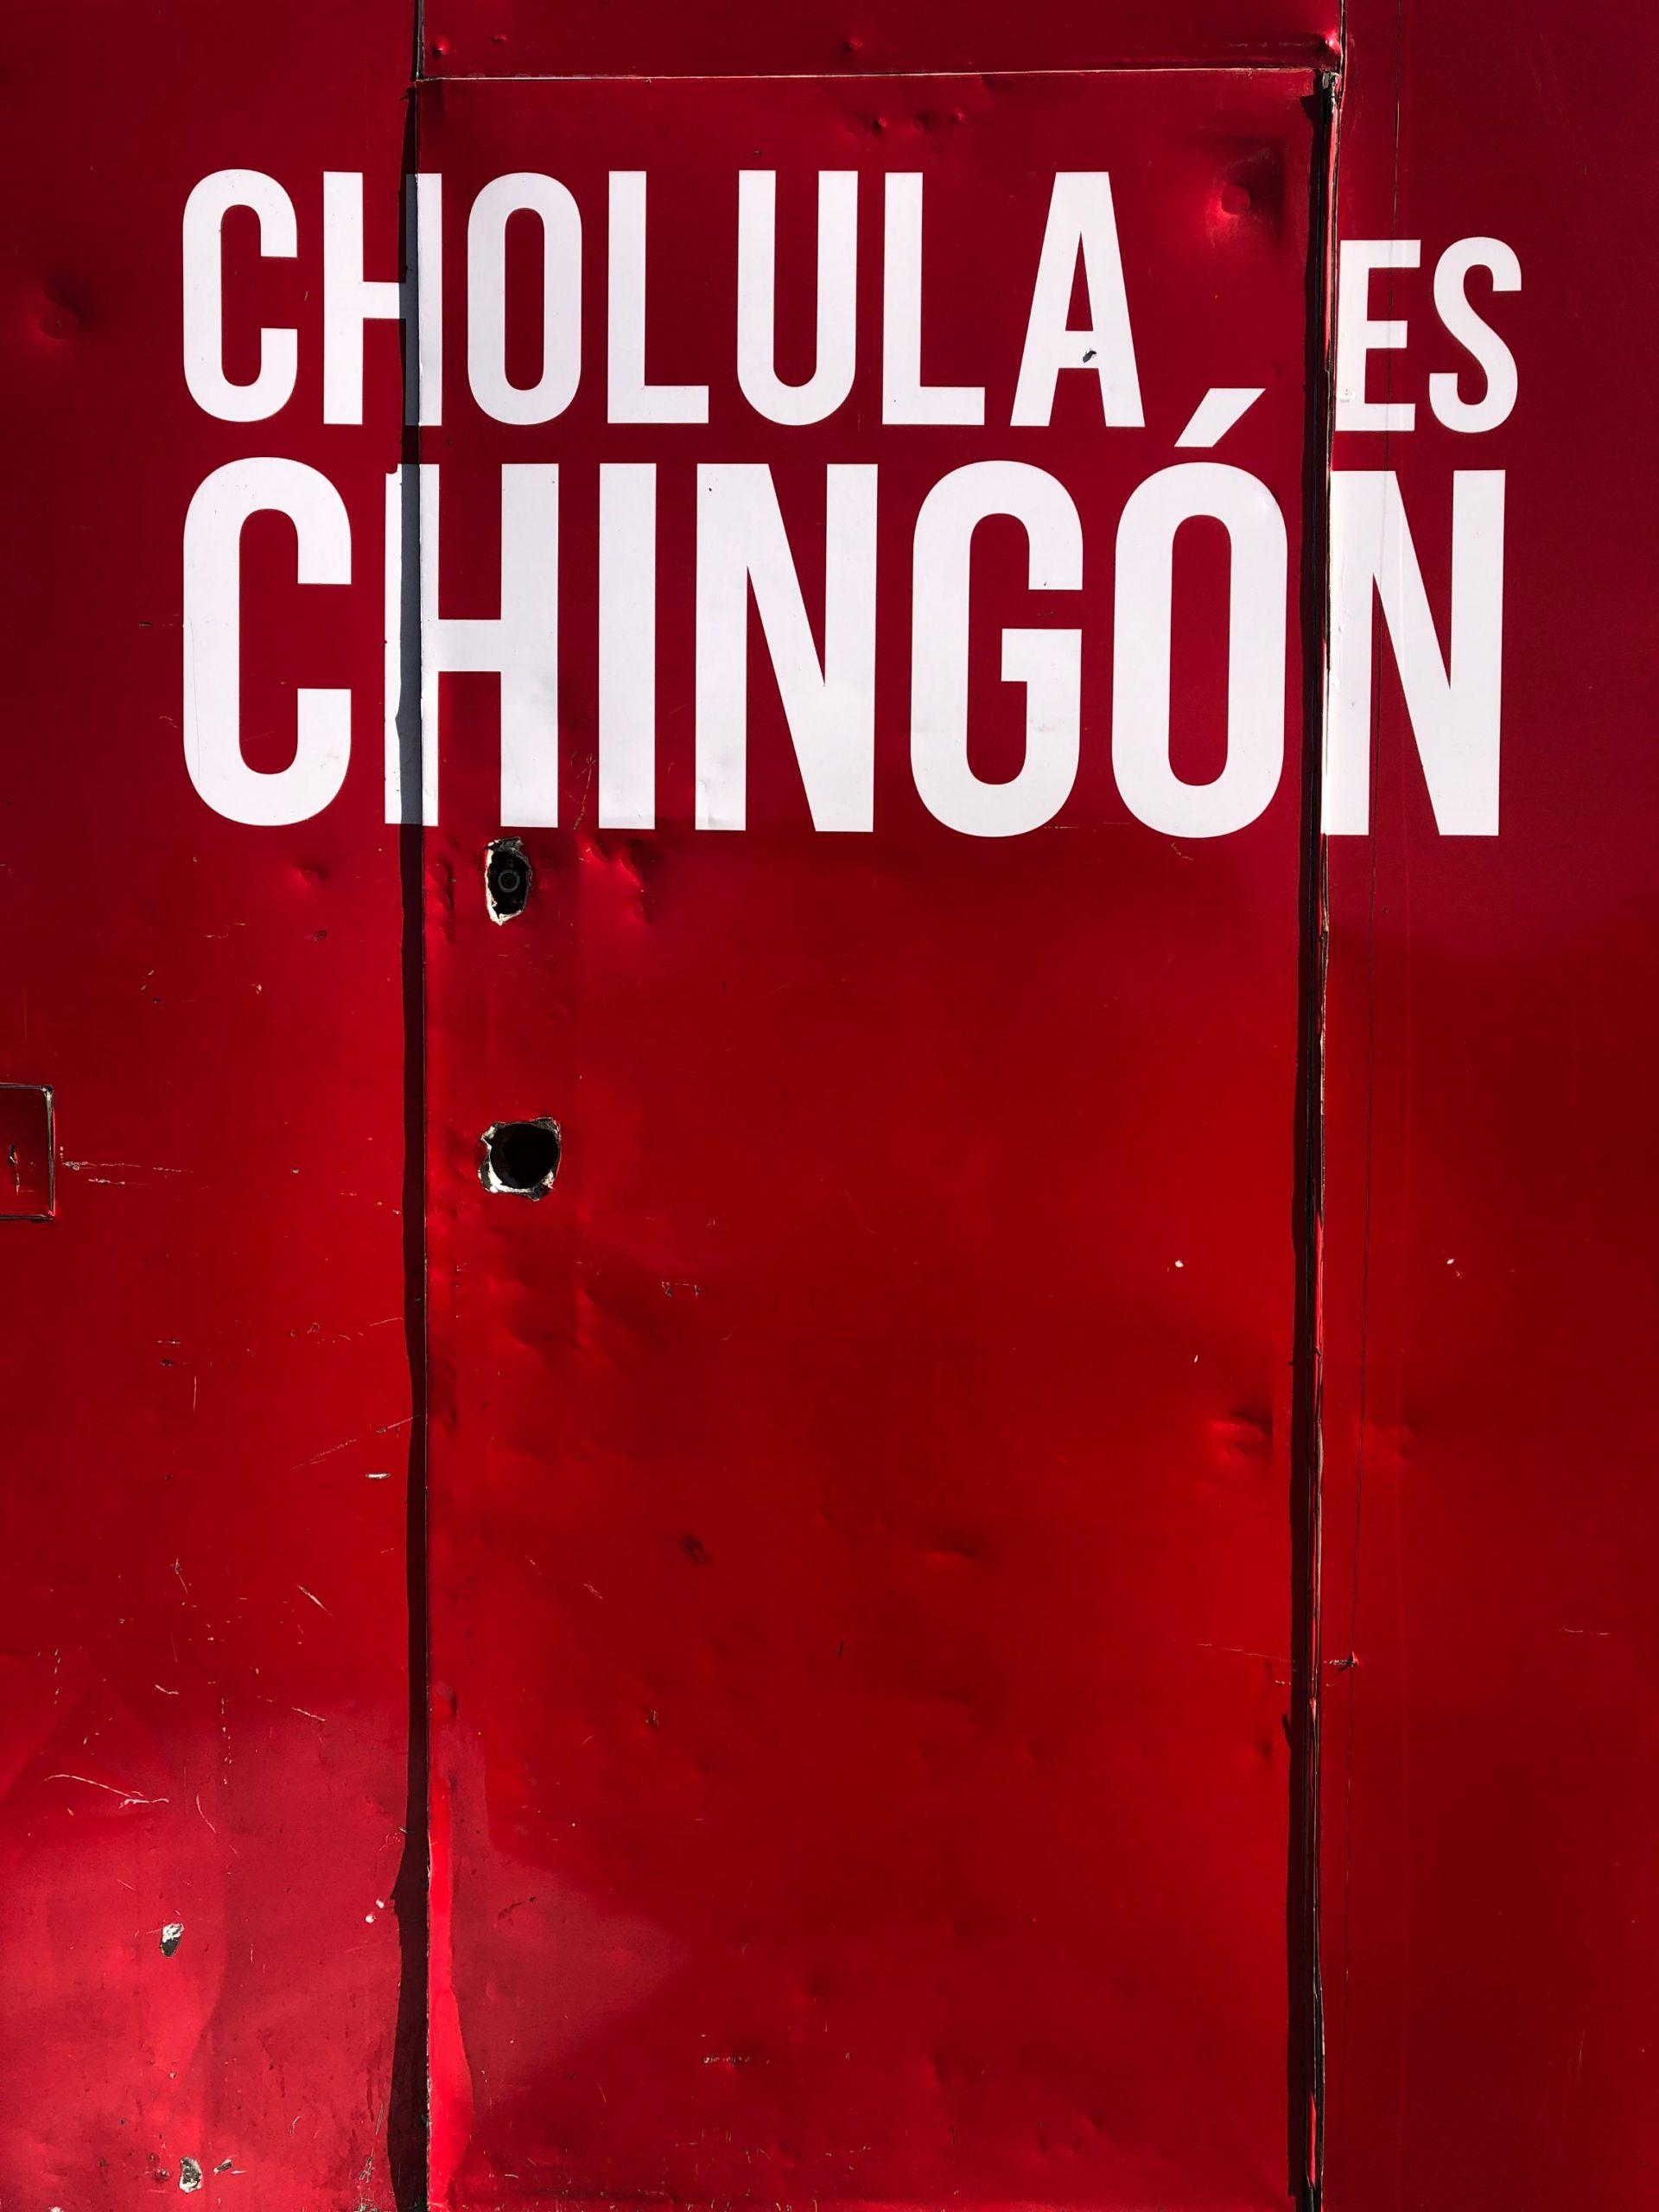 'Cholula es Chingon' sign